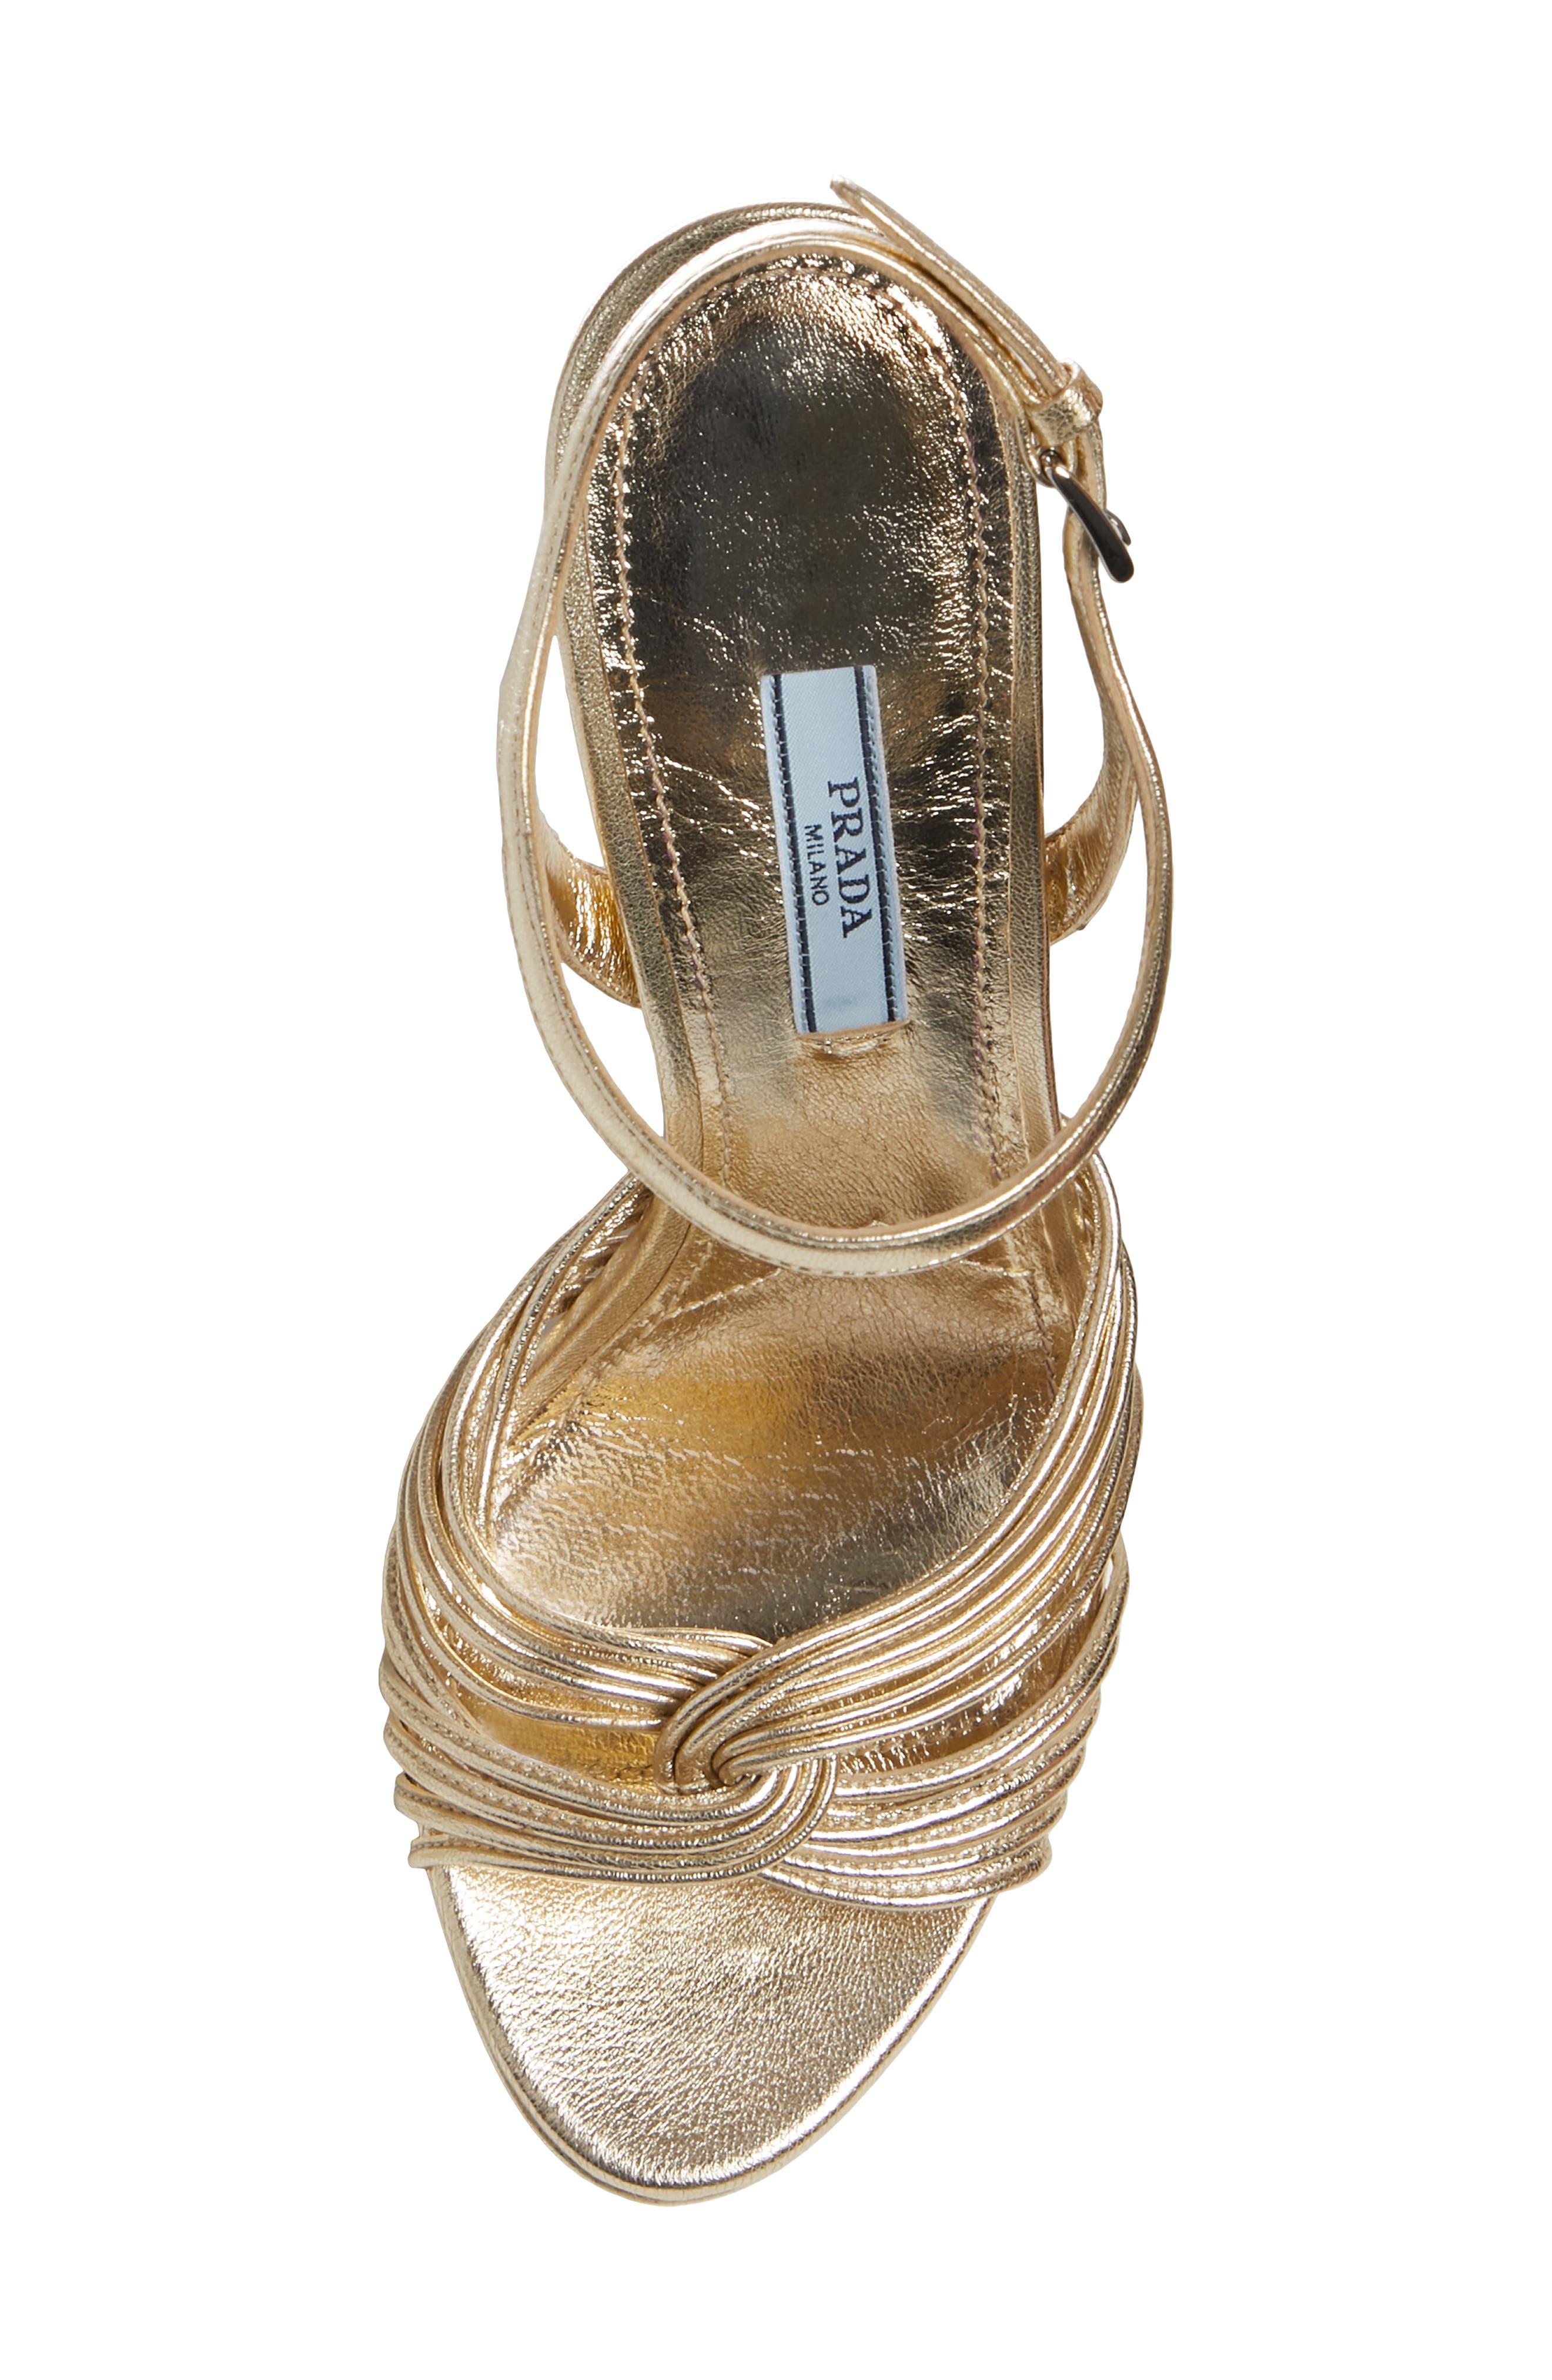 Roping Ankle Strap Sandal,                             Alternate thumbnail 5, color,                             PIRITE LEATHER